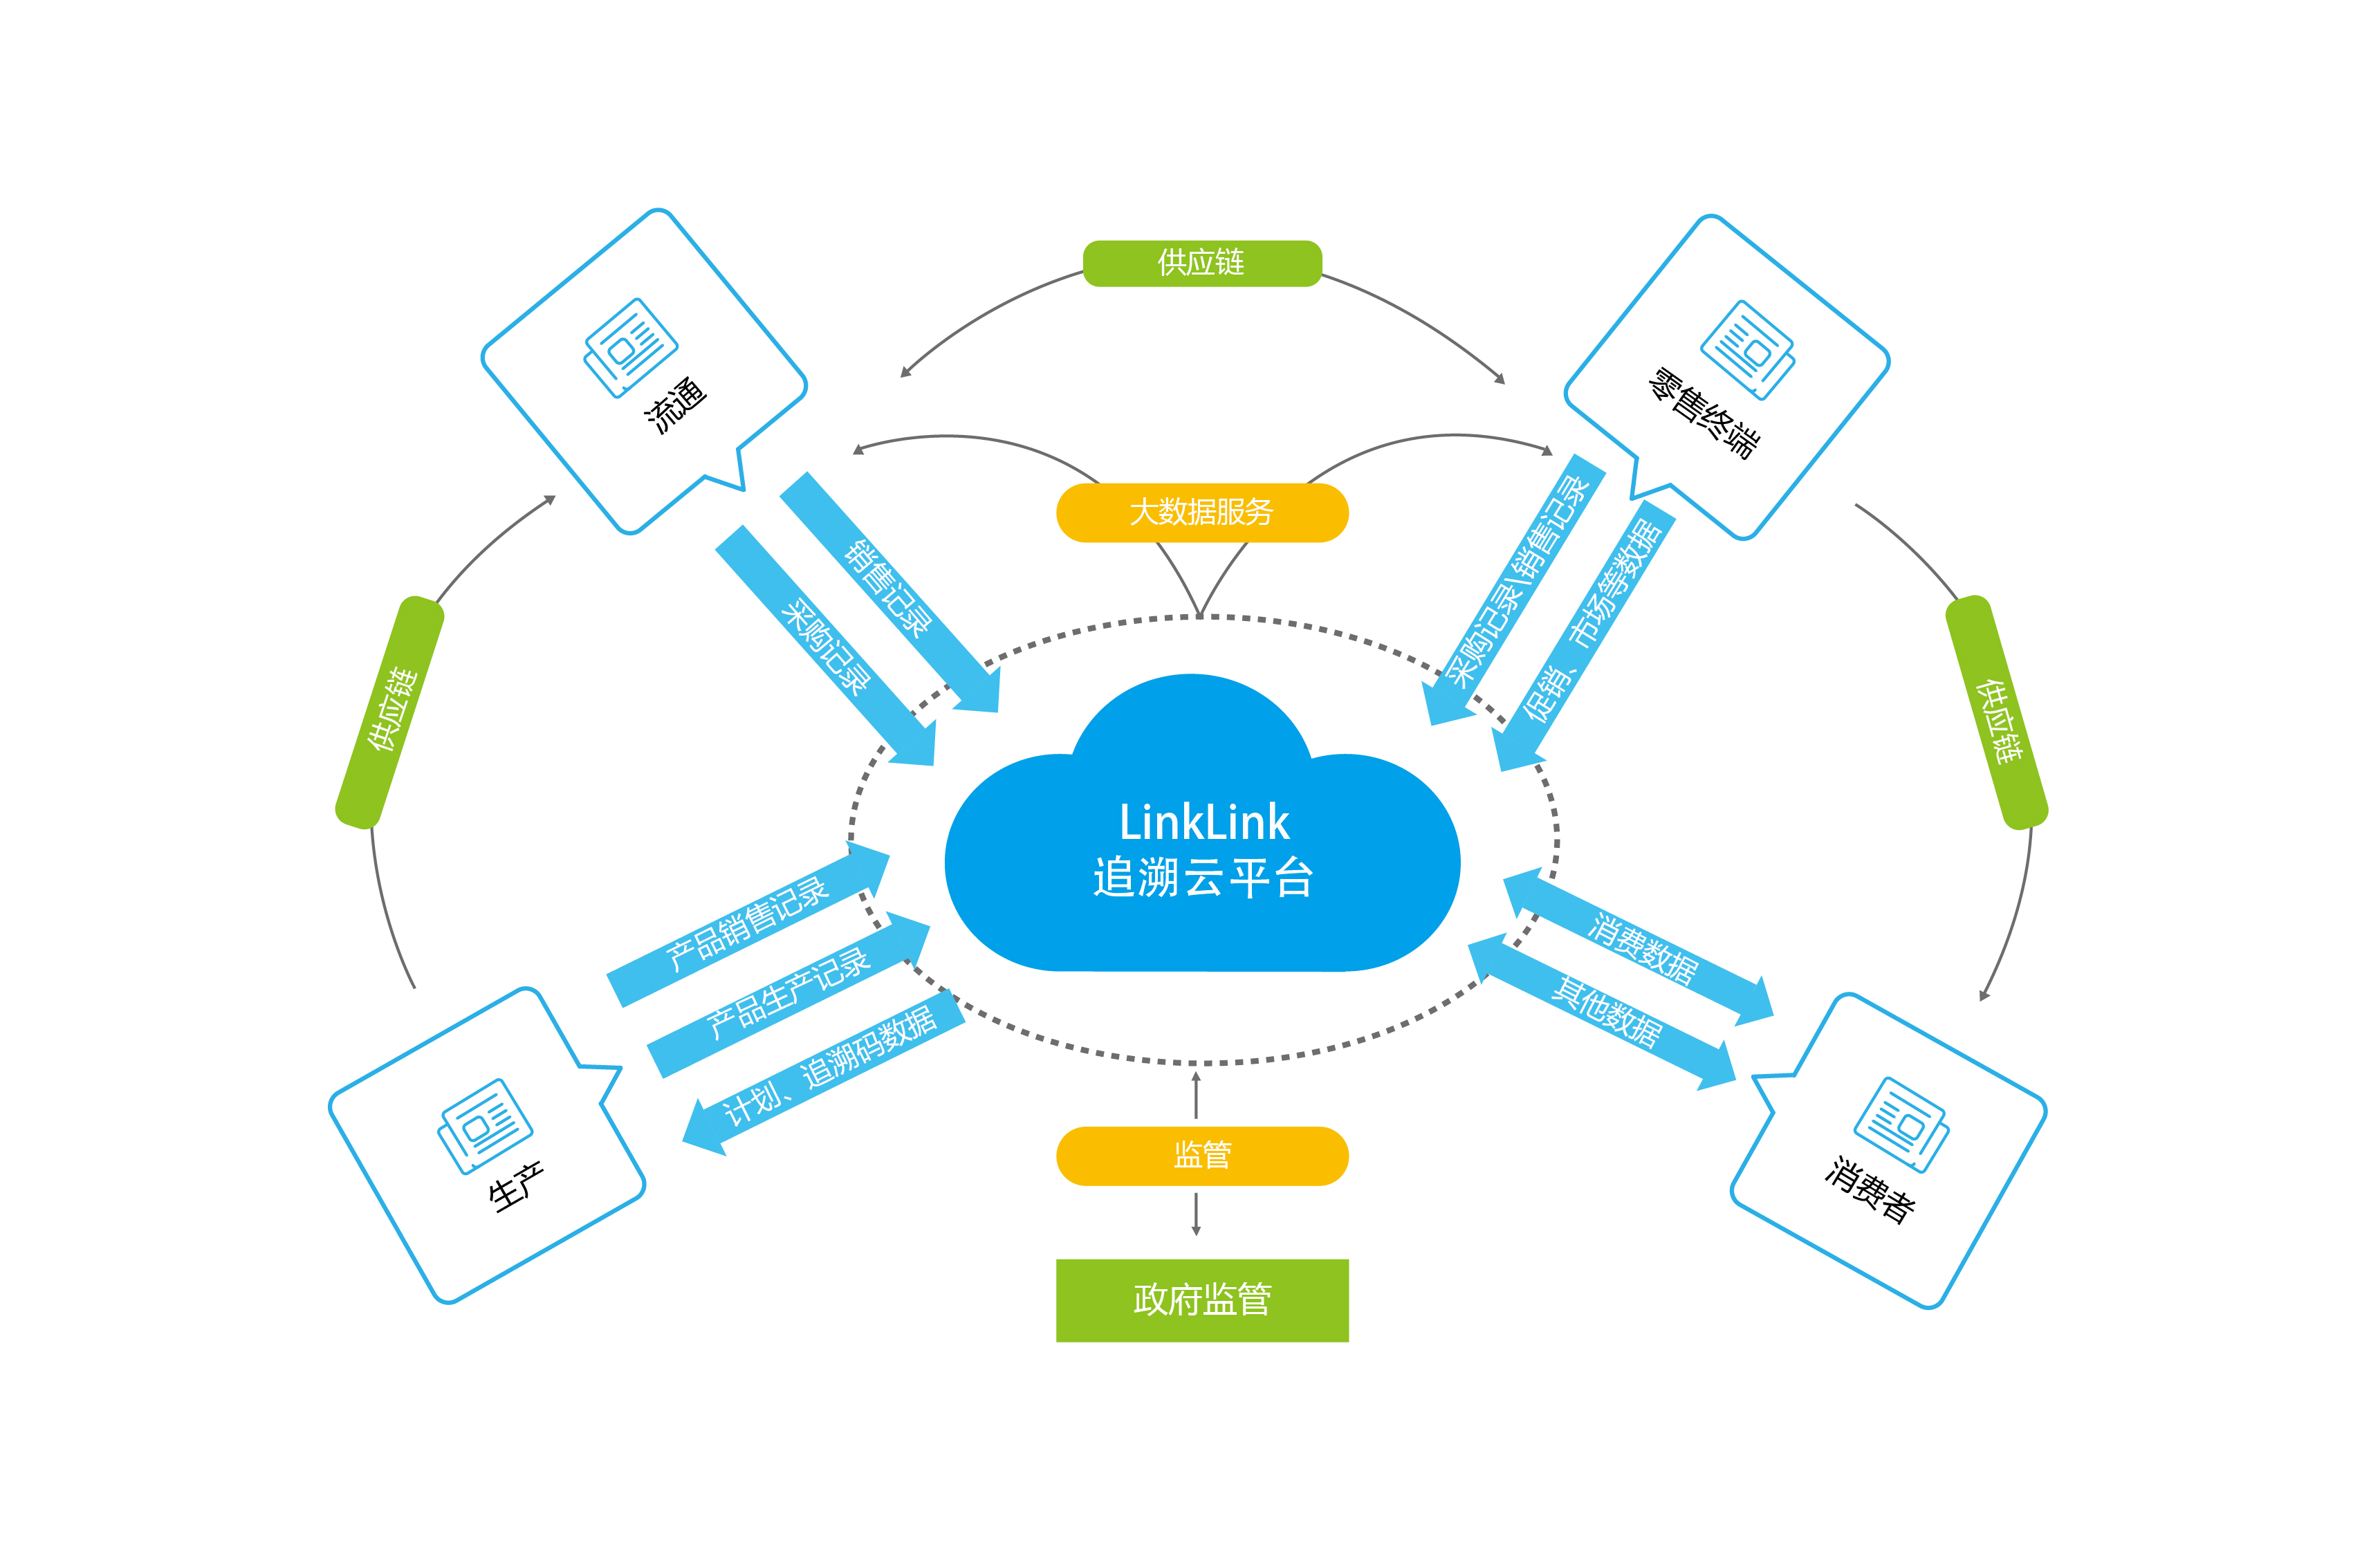 Linklink配图1-01.jpg